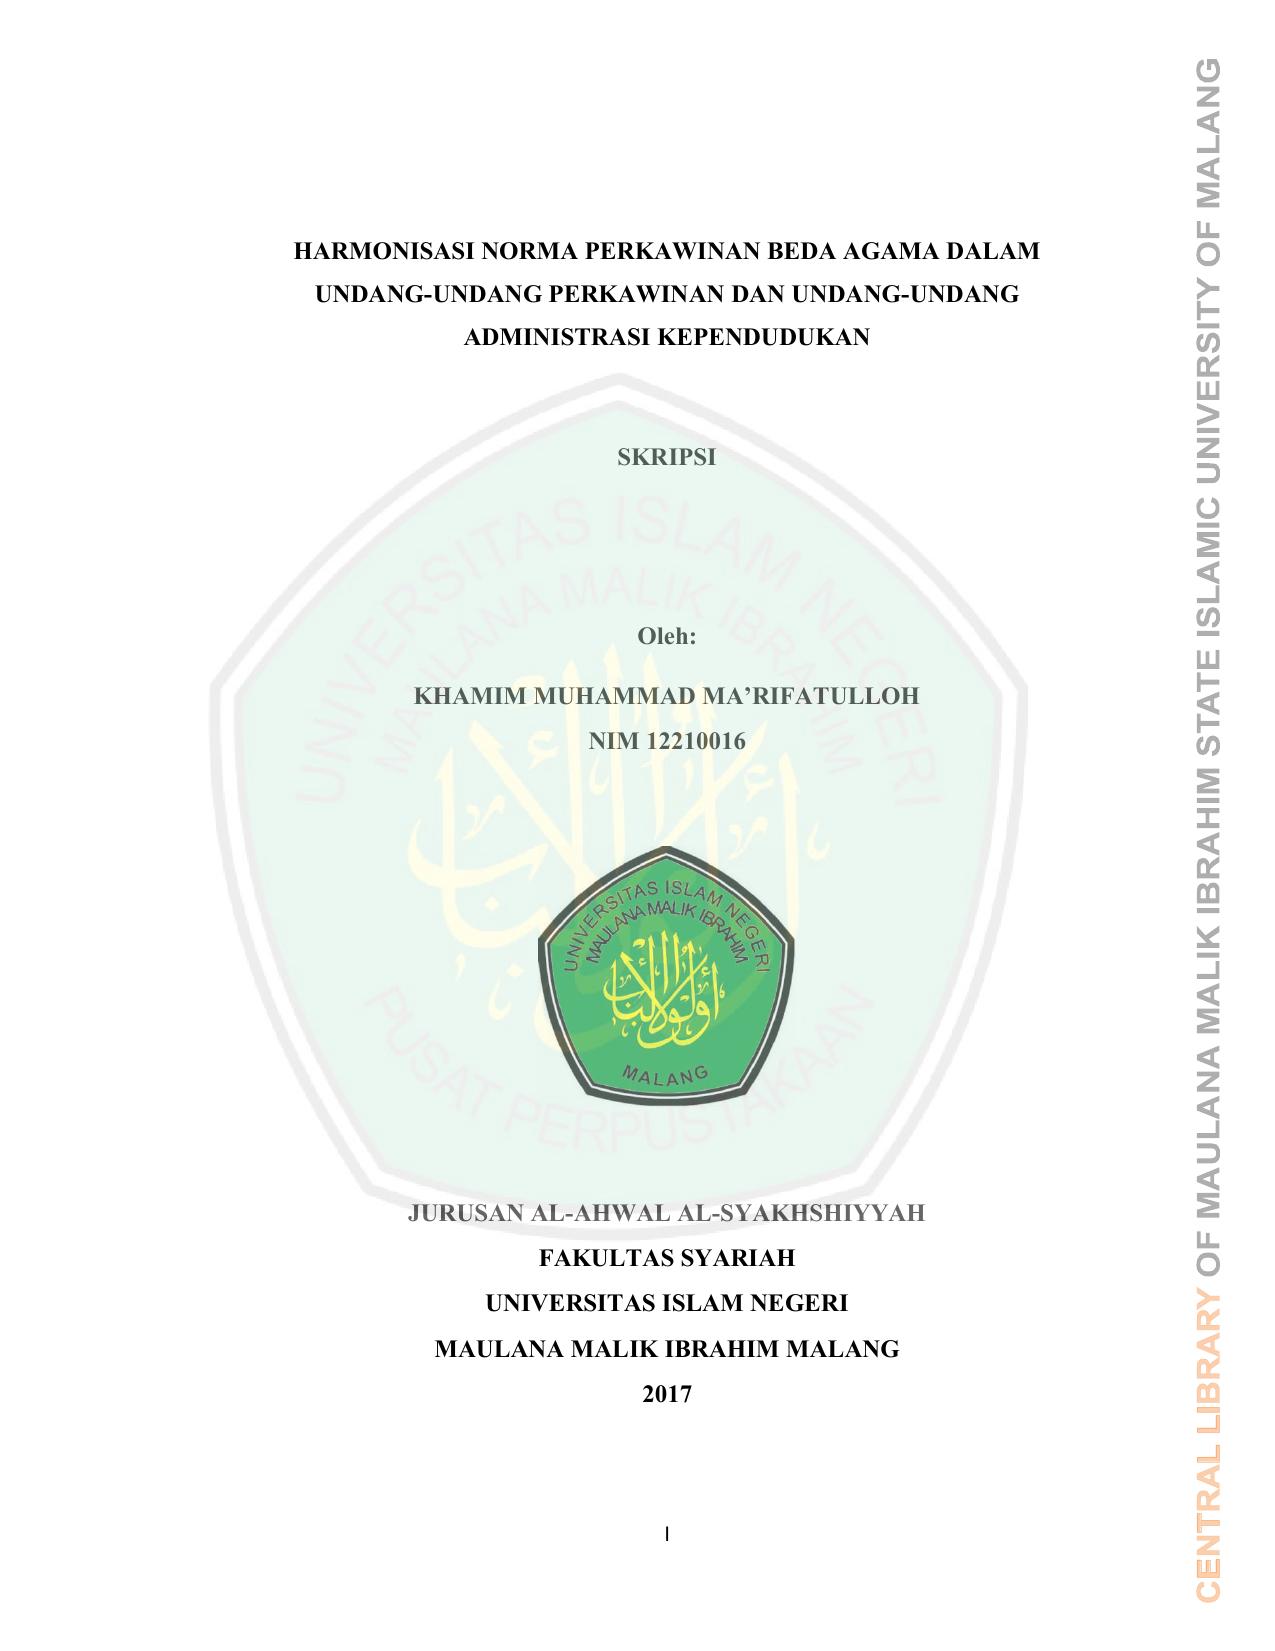 Harmonisasi Norma Perkawinan Beda Agama Dalam